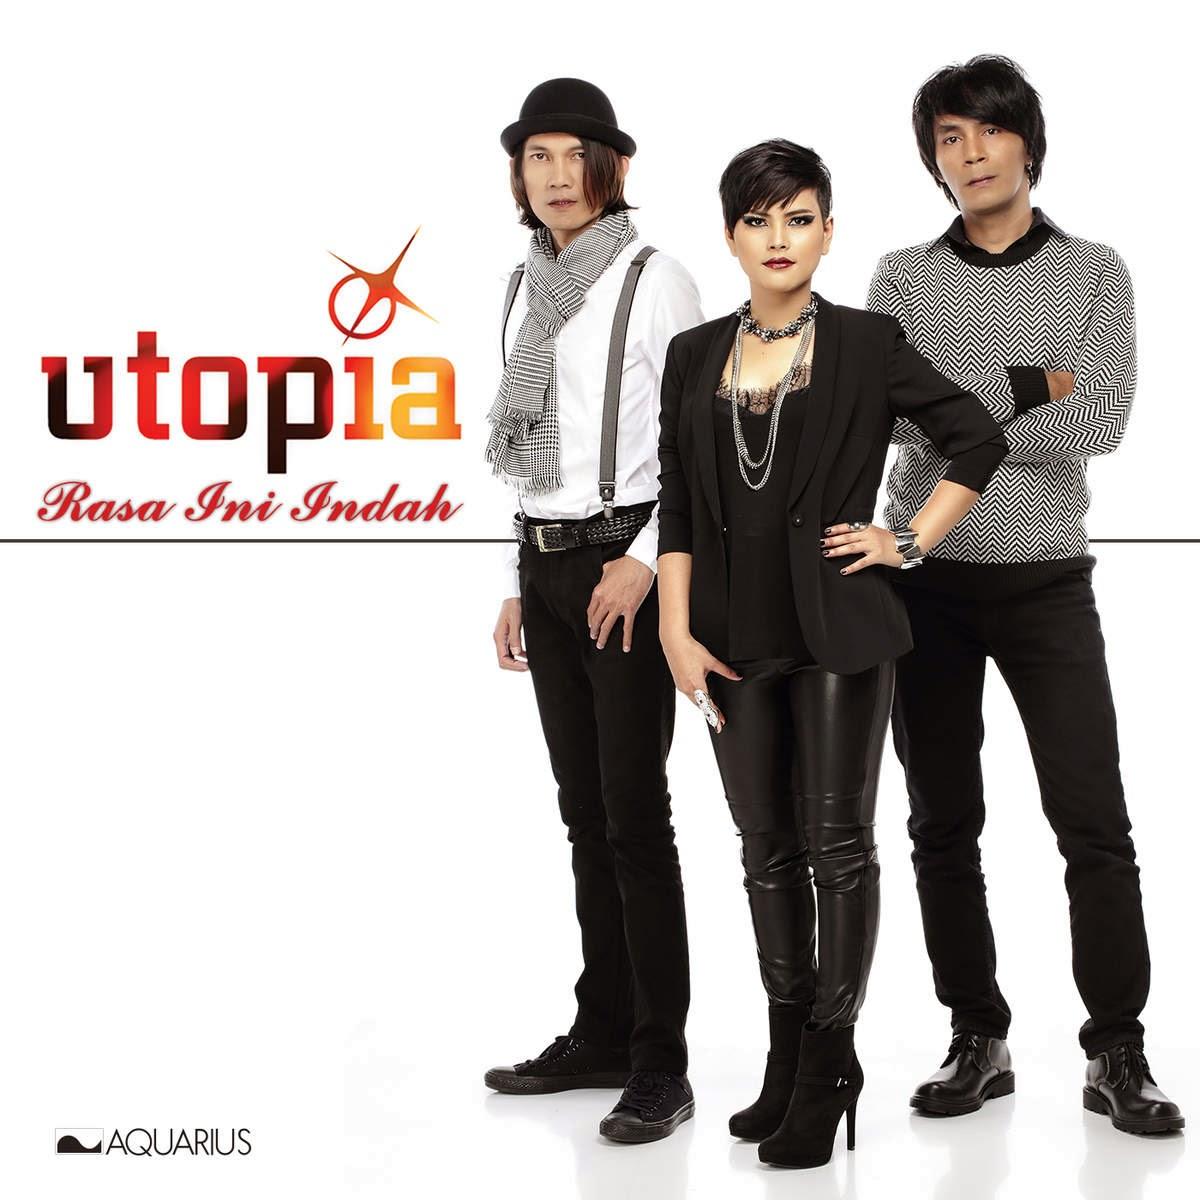 Utopia - Rasa Ini Indah (Ost. 7 Manusia Harimau)